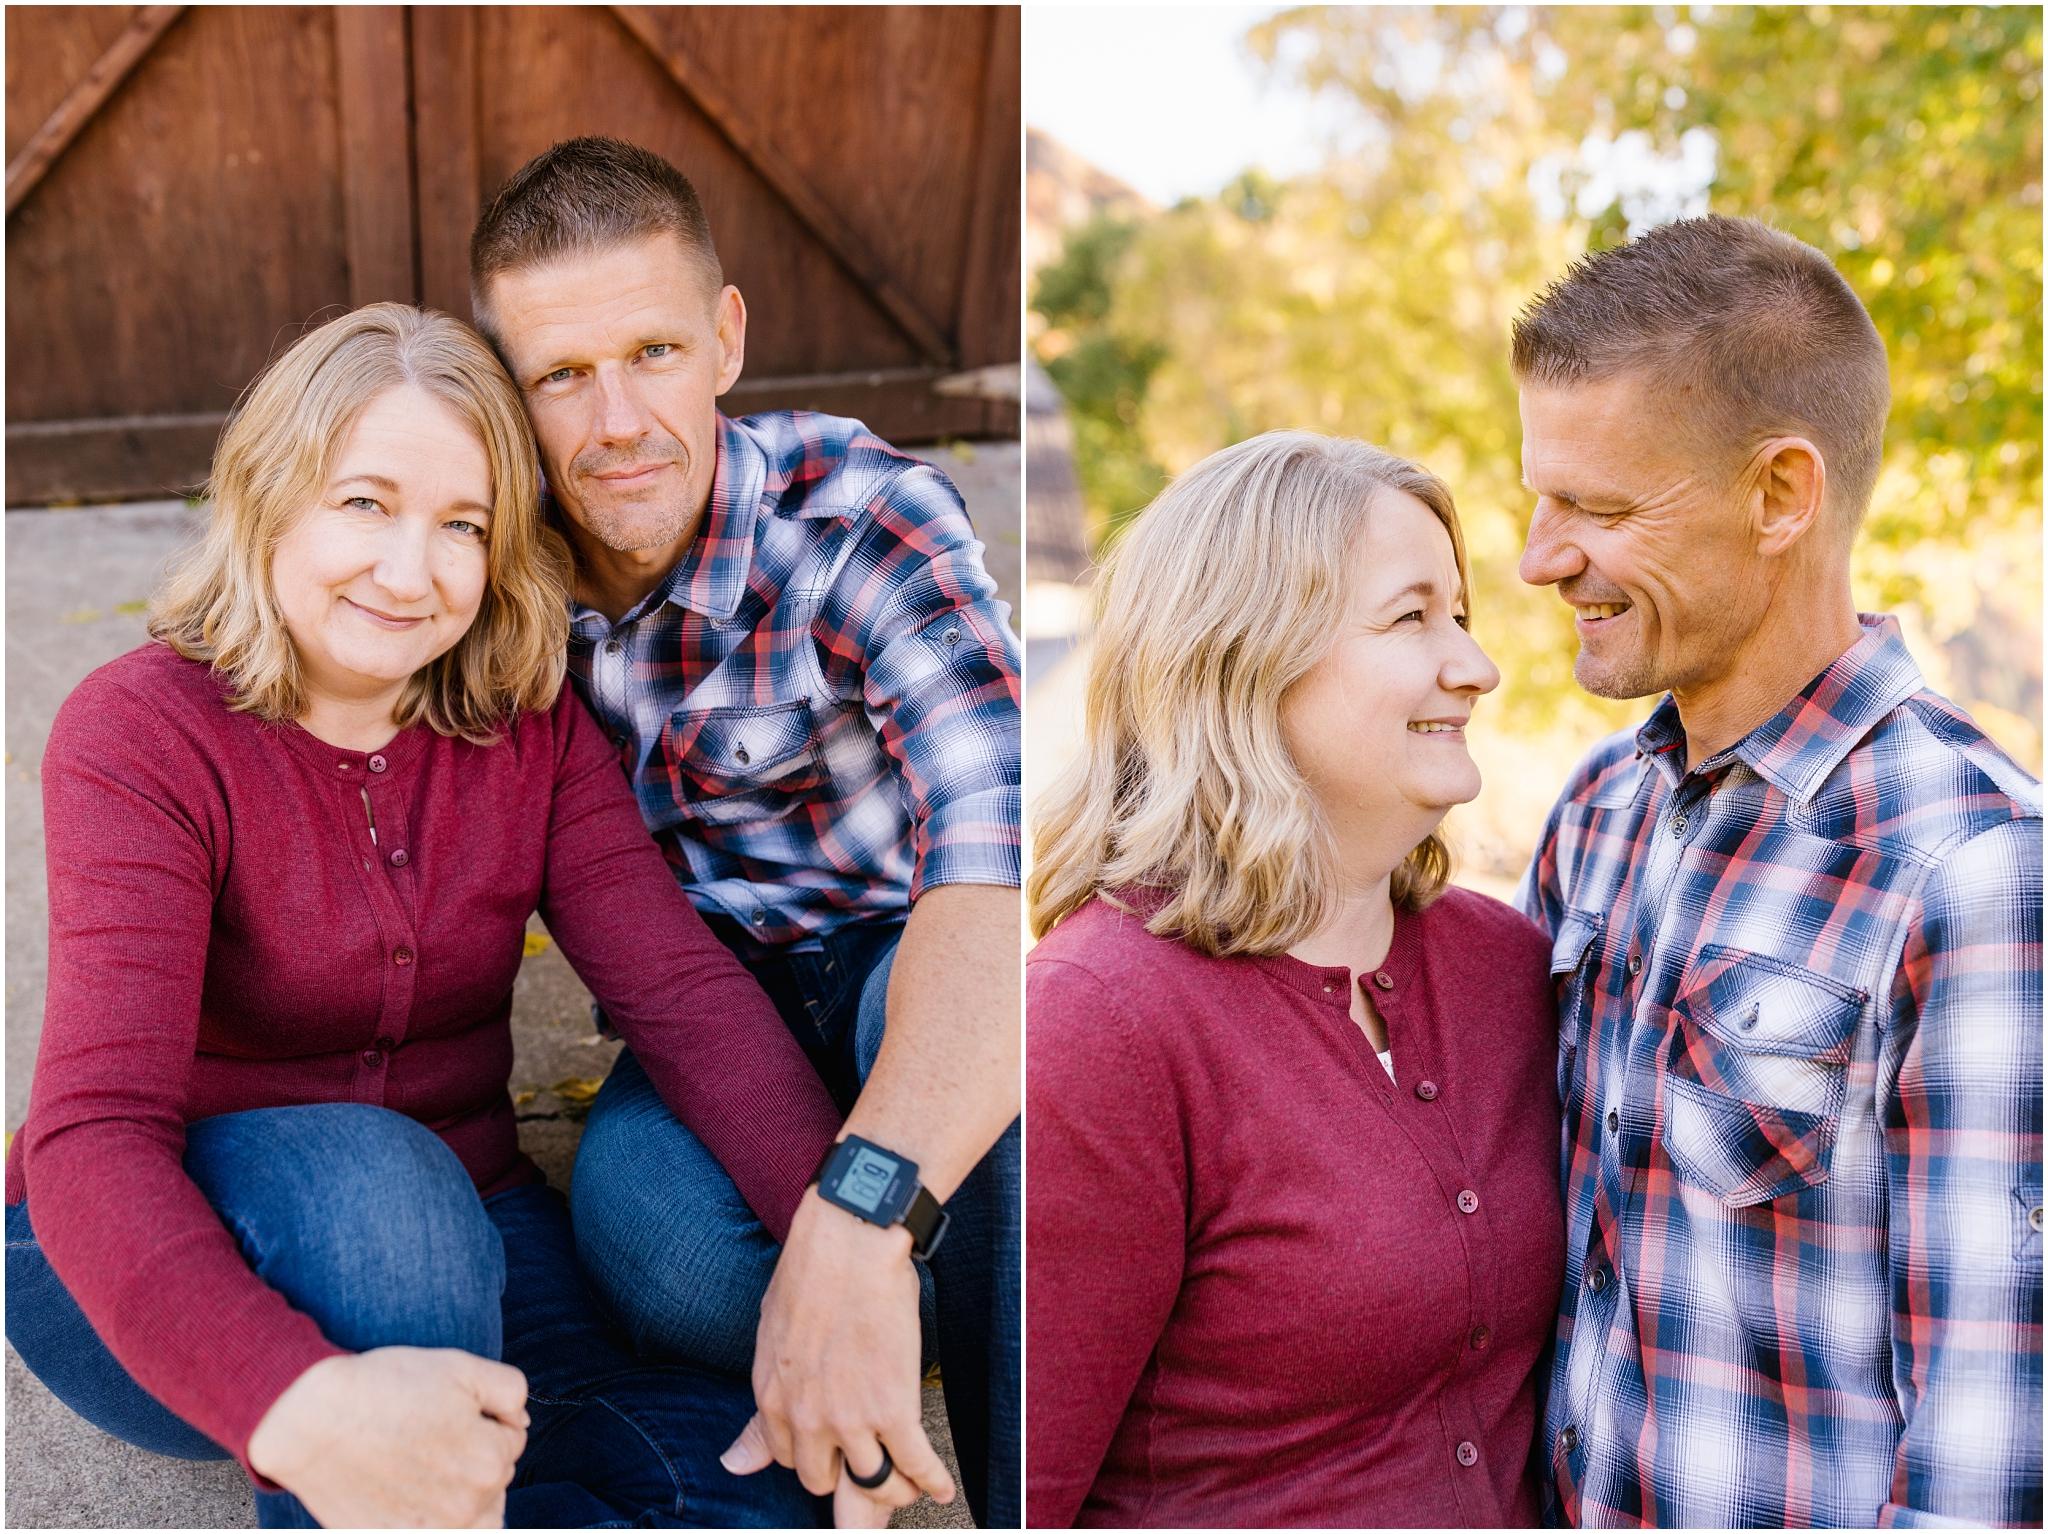 Nielsen--73_Lizzie-B-Imagery-Utah-Family-Photographer-Salt-Lake-City-Park-City-Utah-County-Hobble-Creek-Canyon-Jolleys-Ranch.jpg